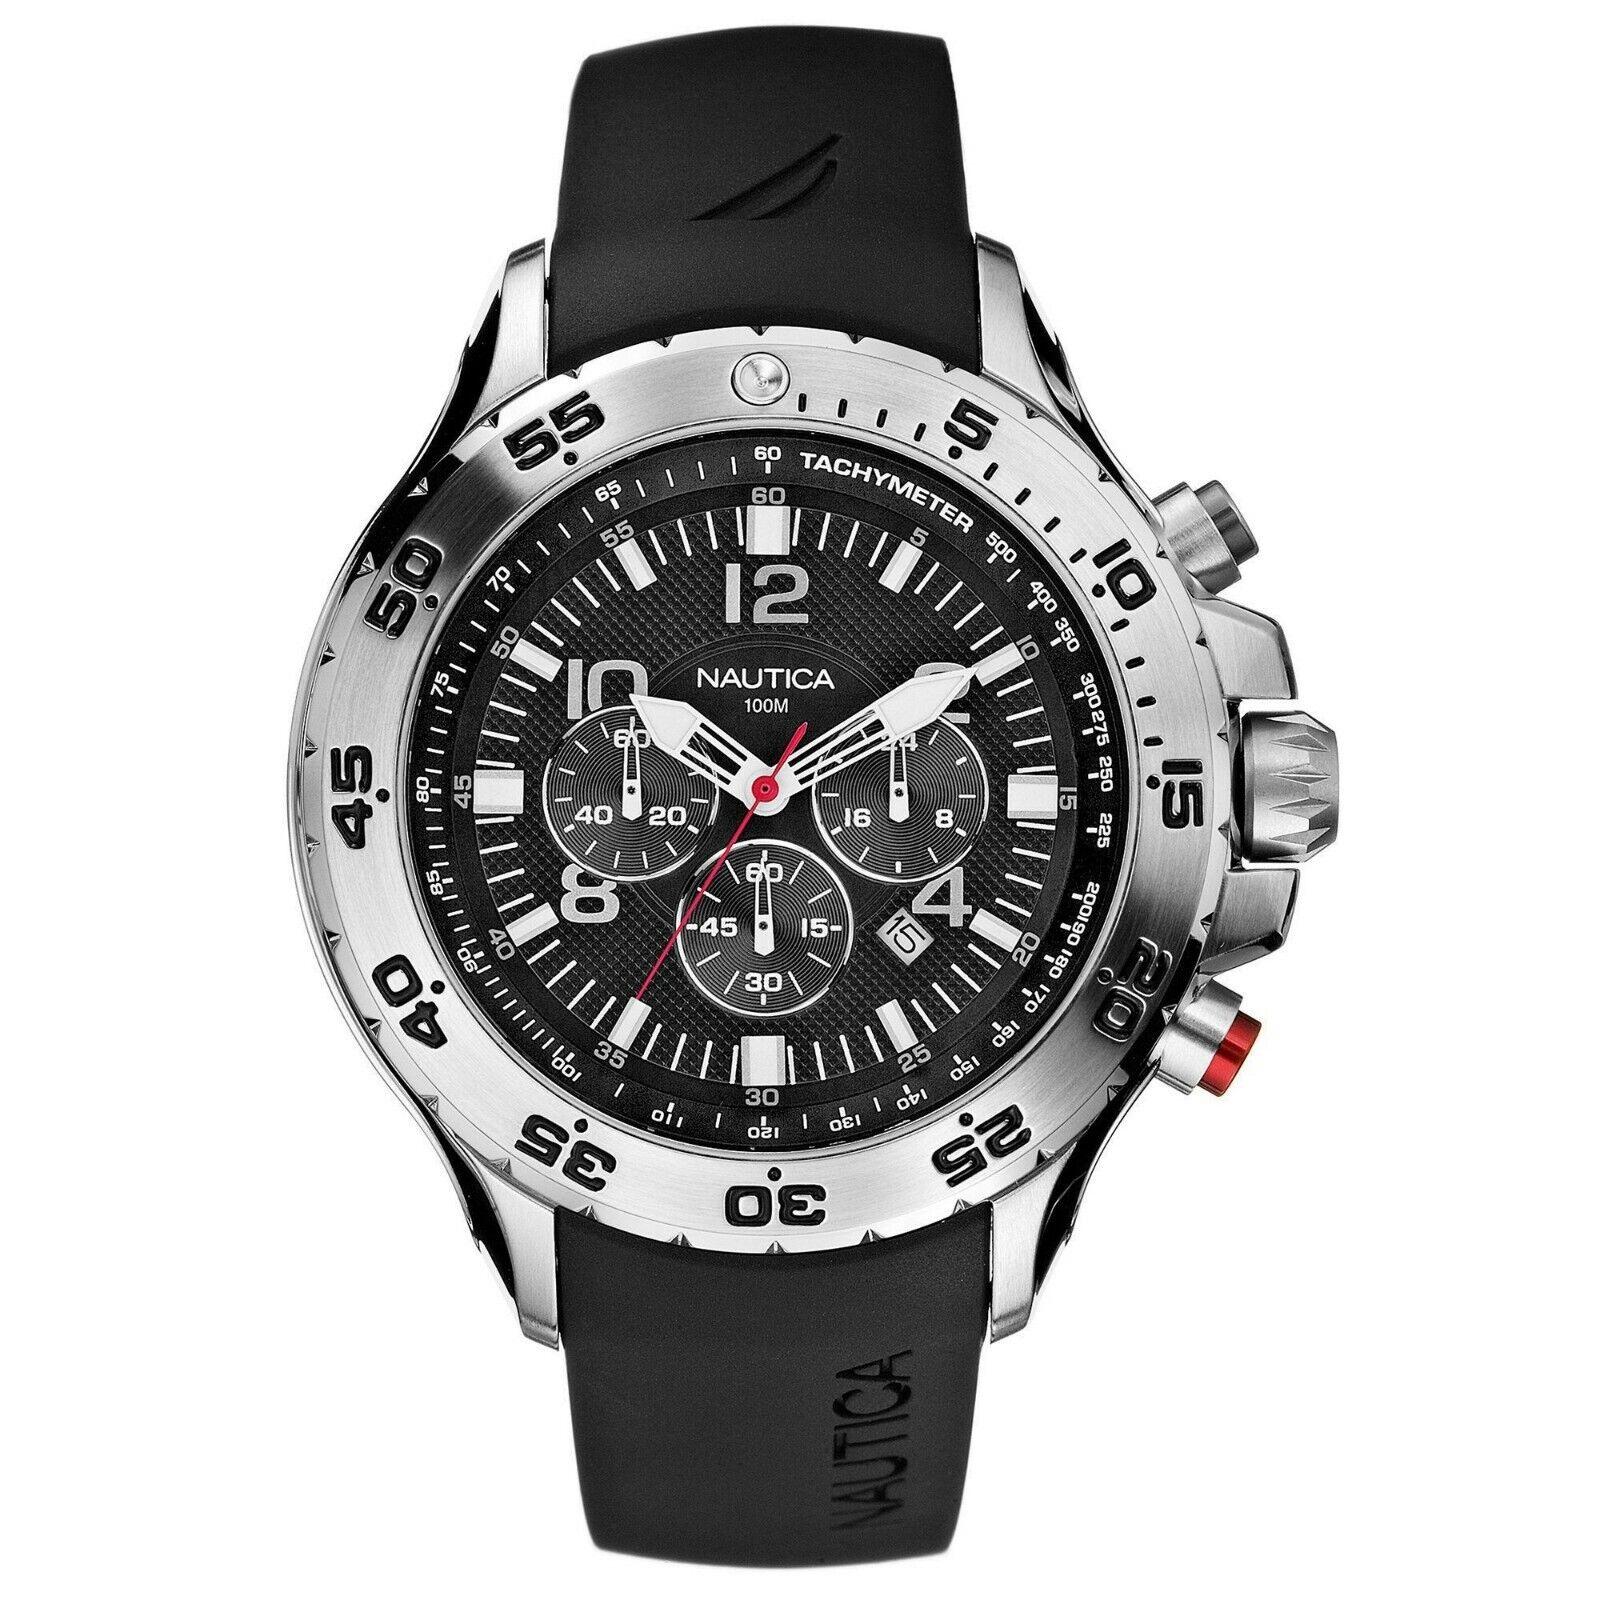 Nautica NST Chronograph Black Rubber Strap Mens Watch N14536G